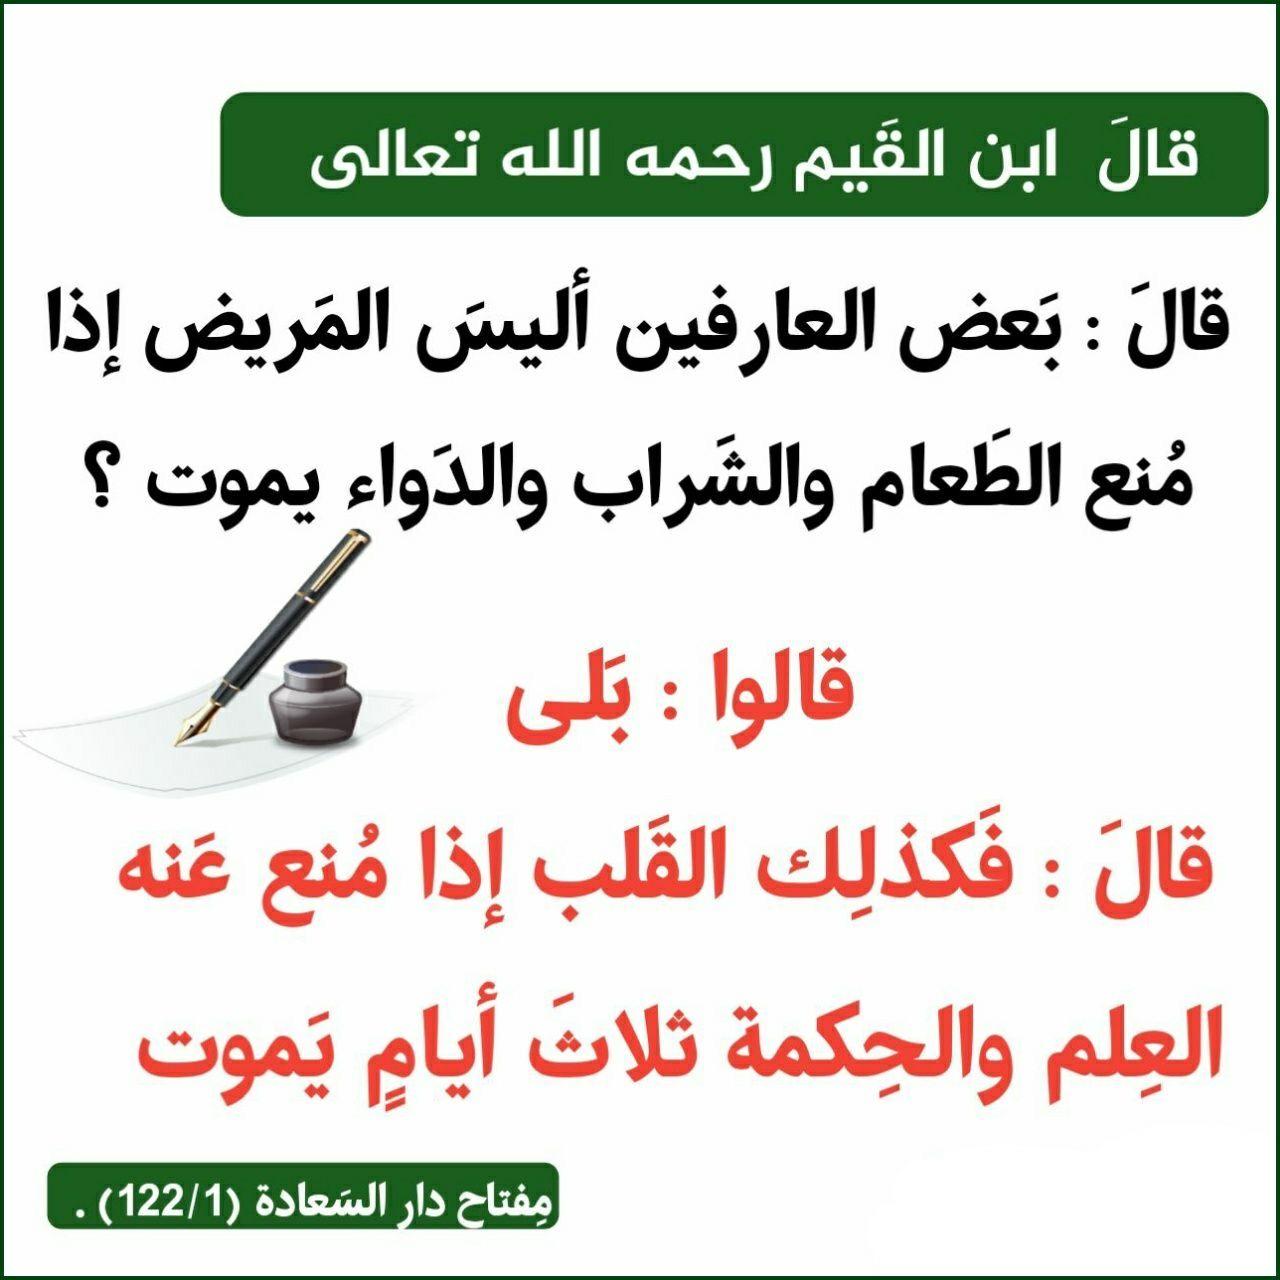 Pin By Wazakr253 On أقوال الصحابة والعلماء Islam